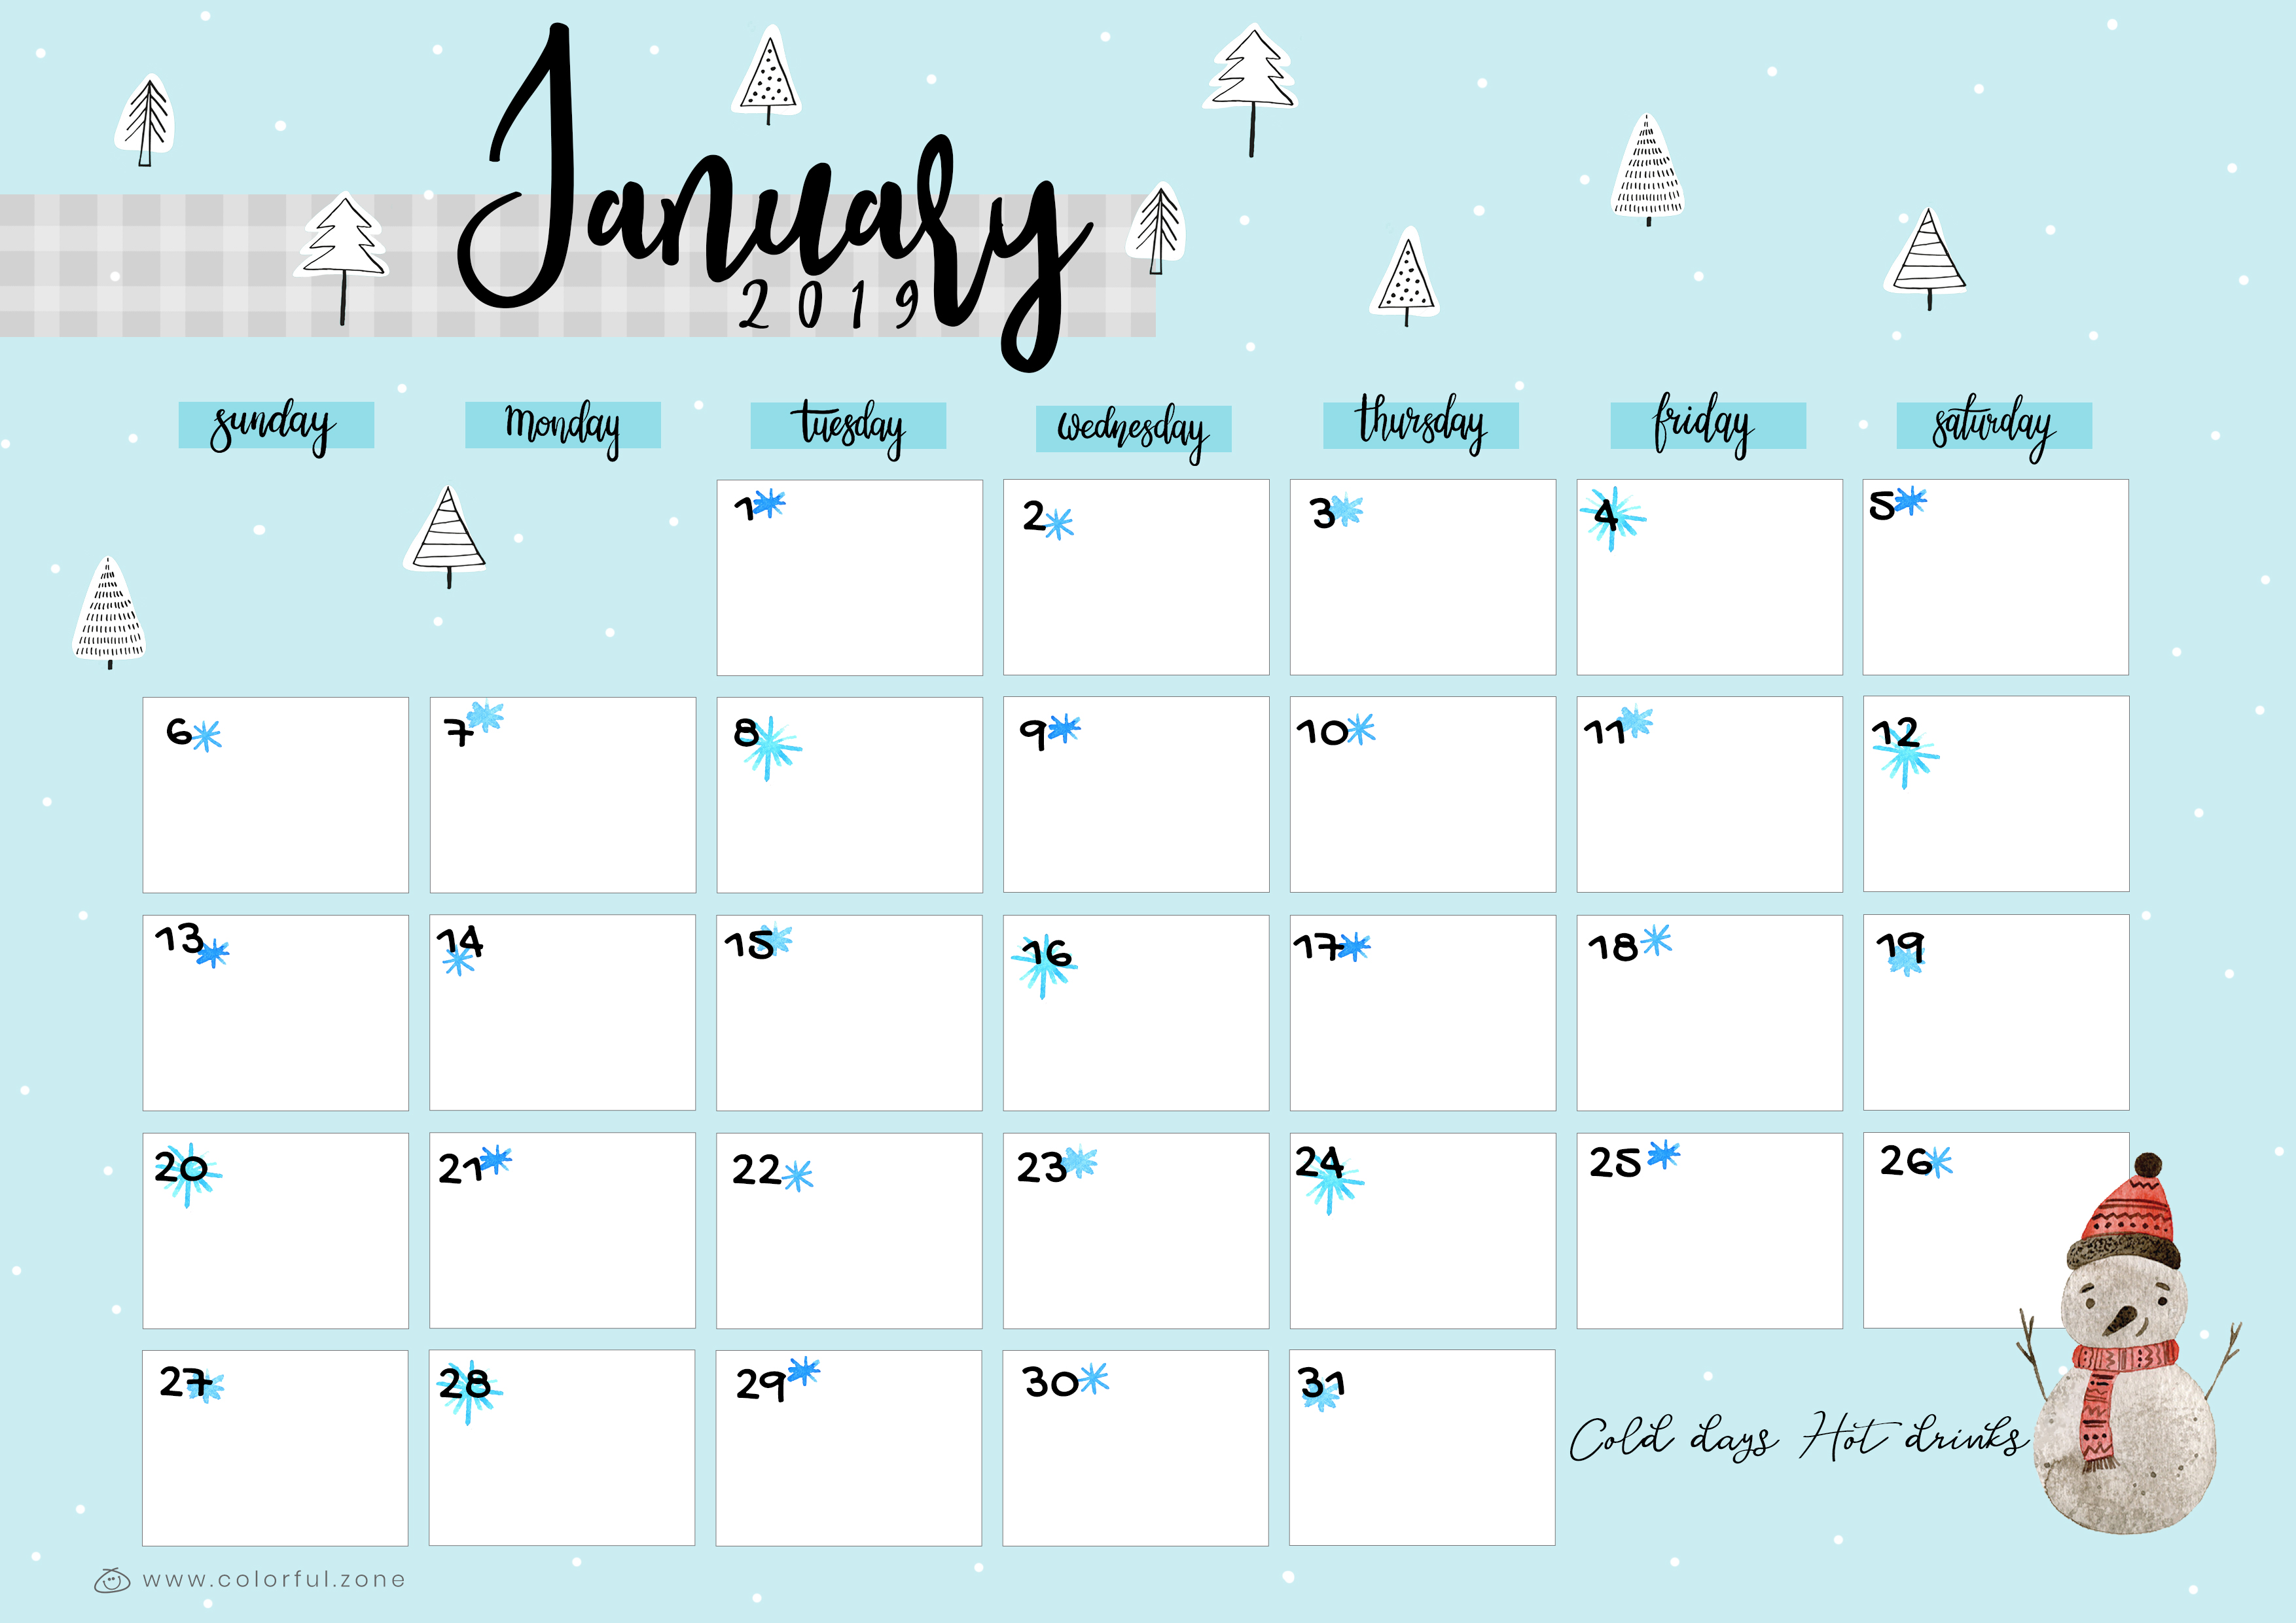 January Printable Colorful Calendar 2019